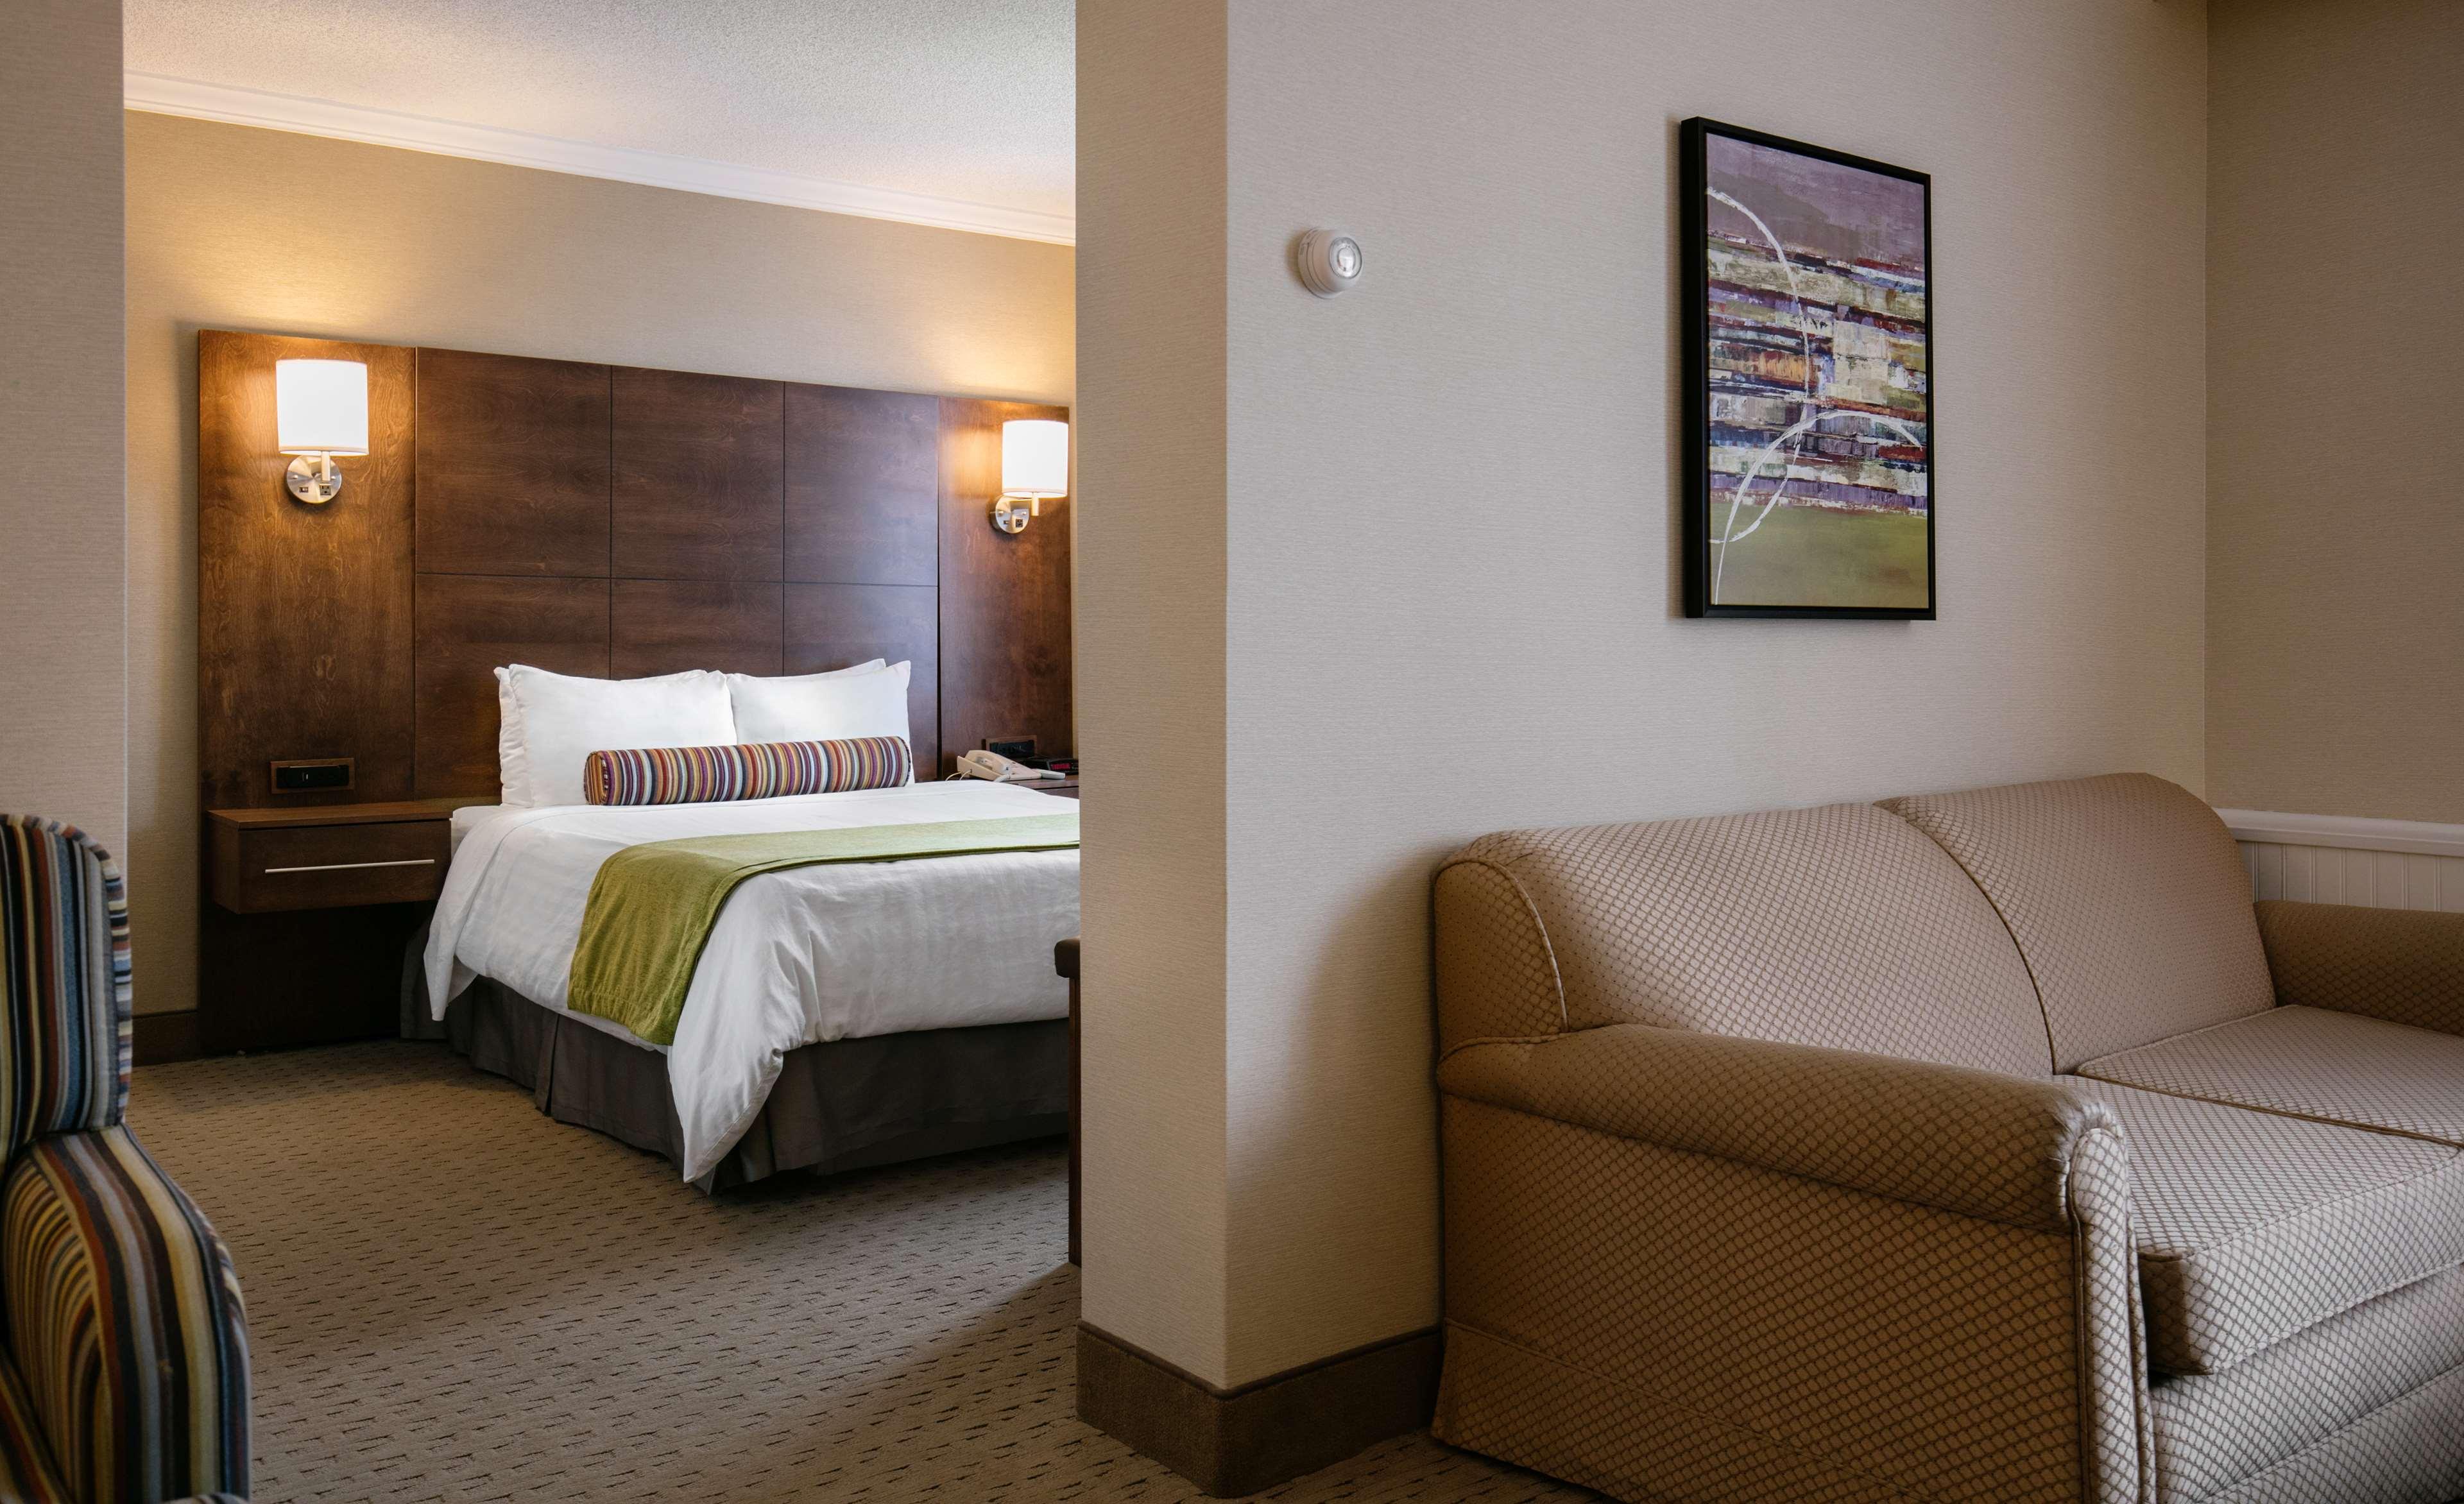 Best Western Ville-Marie Montreal Hotel & Suites à Montreal: Suite